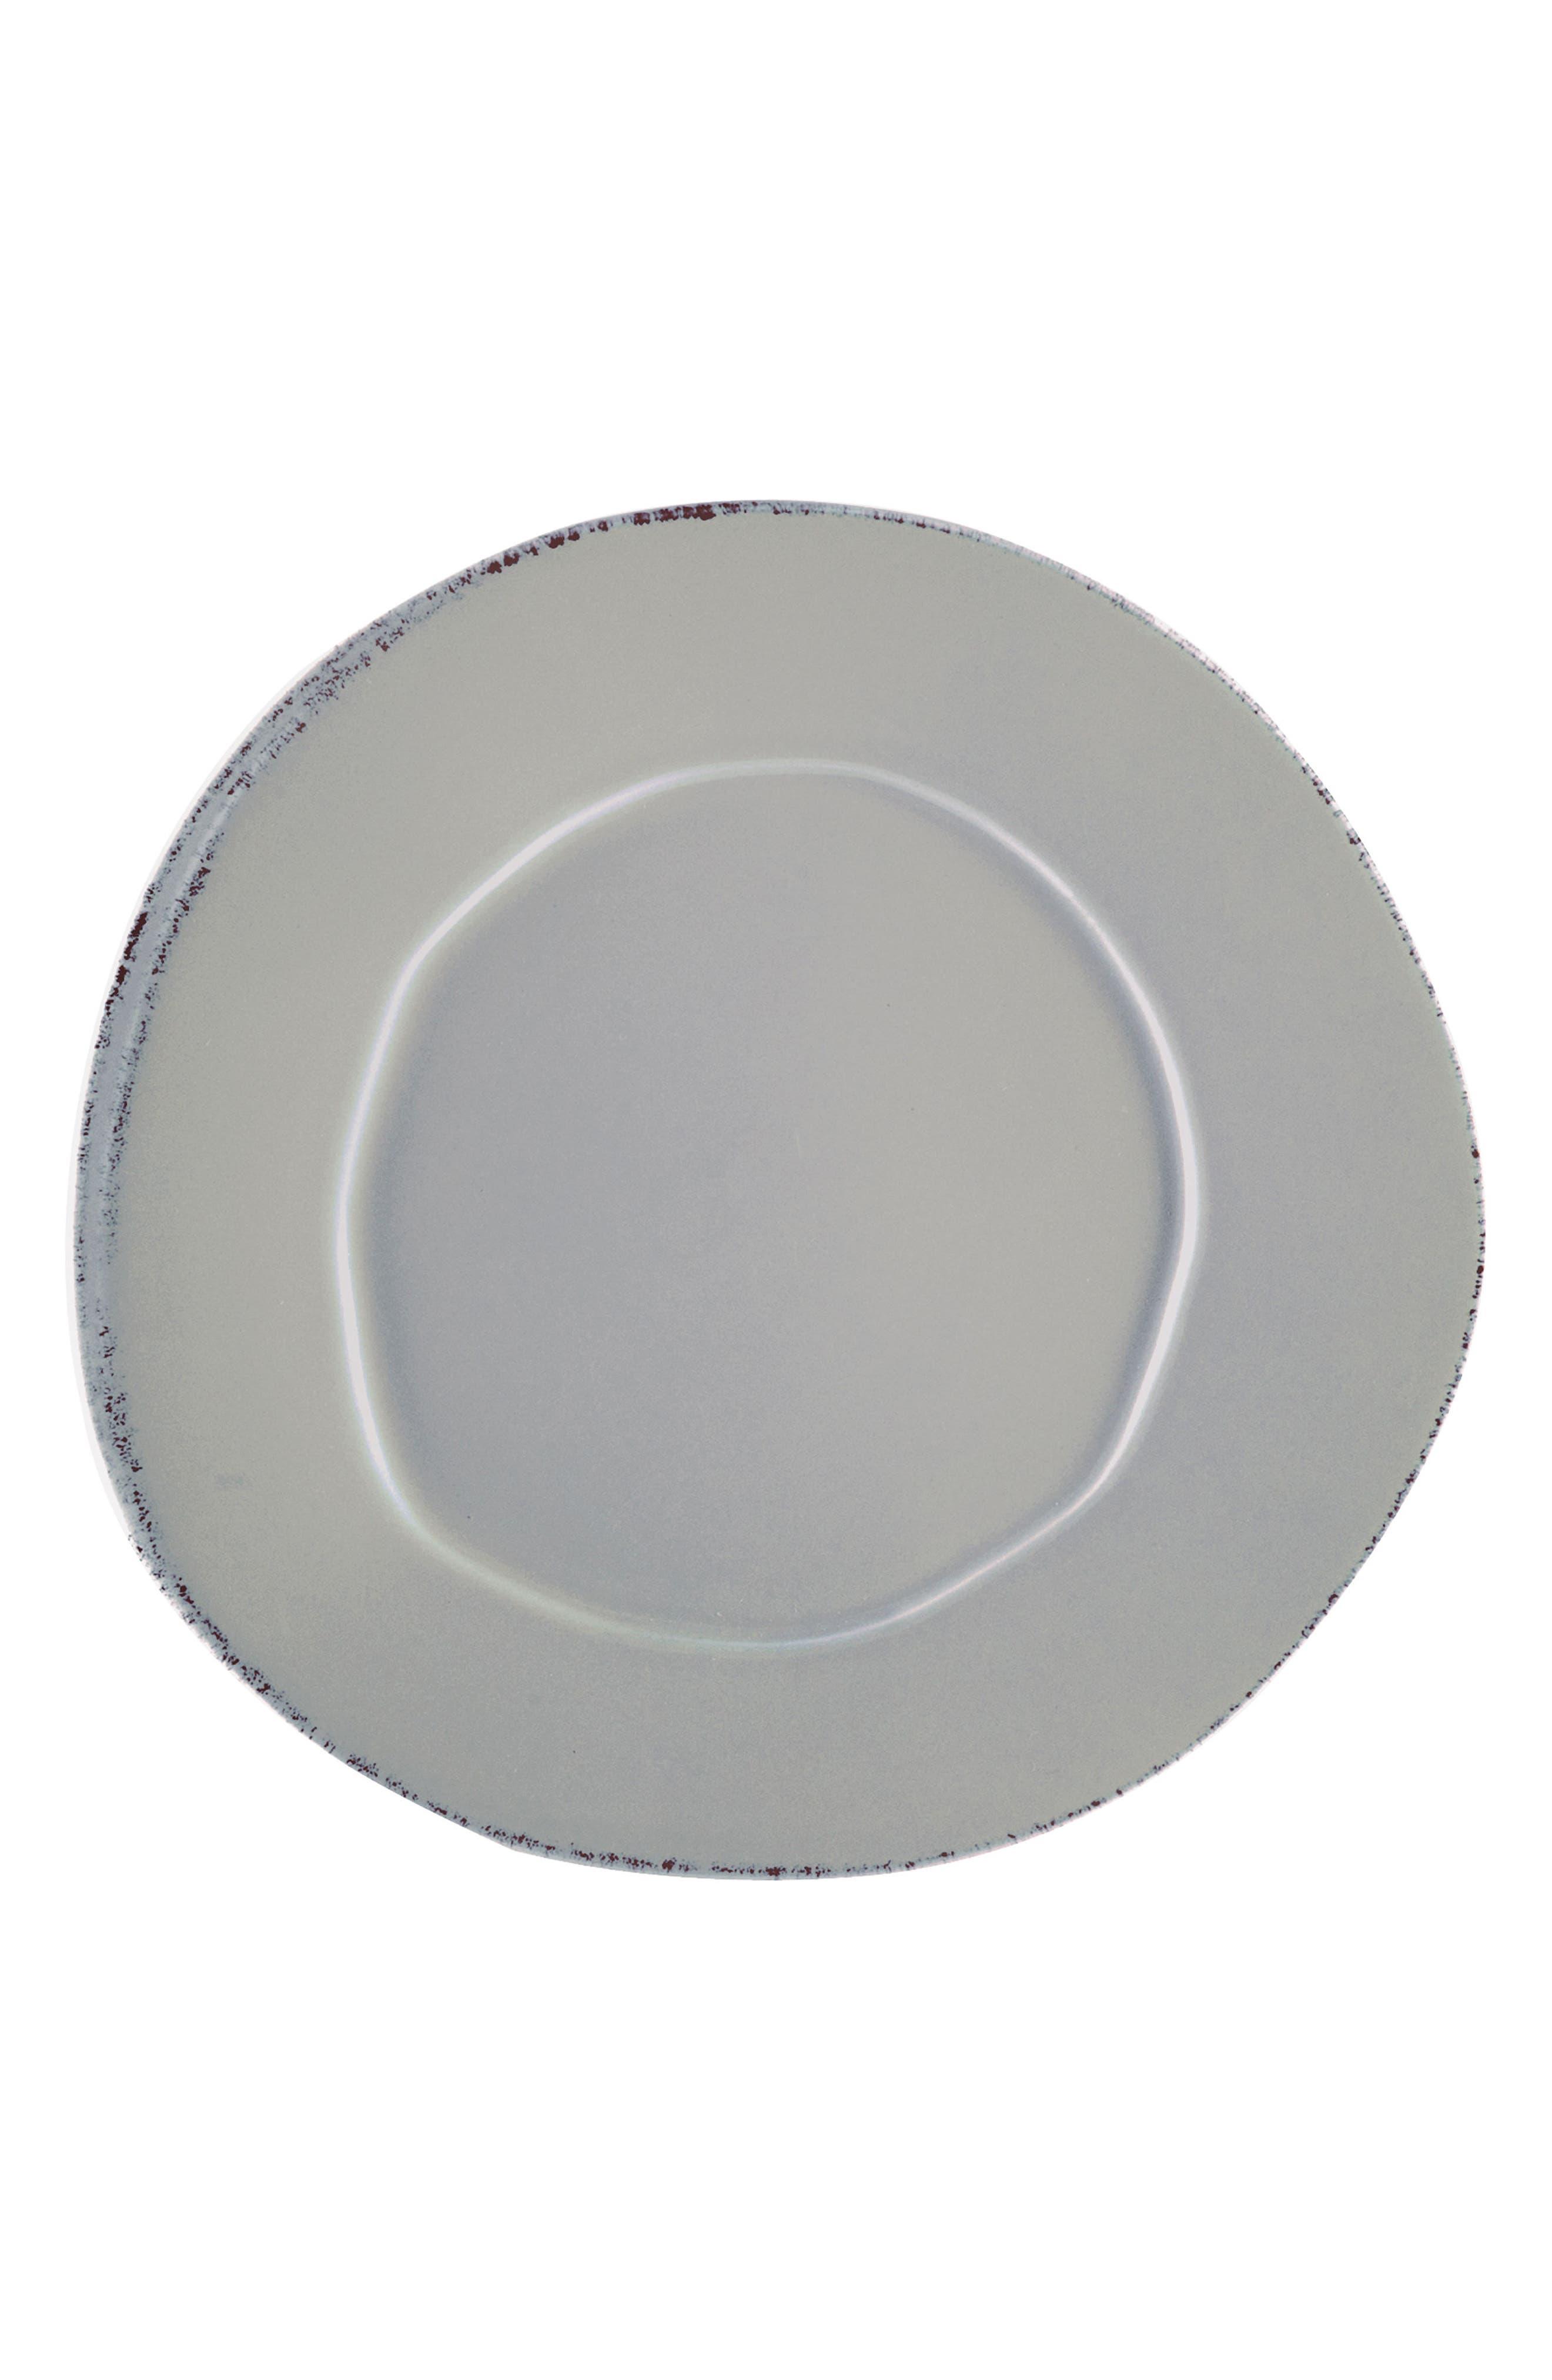 Lastra Stoneware Dinner Plate,                         Main,                         color, Gray